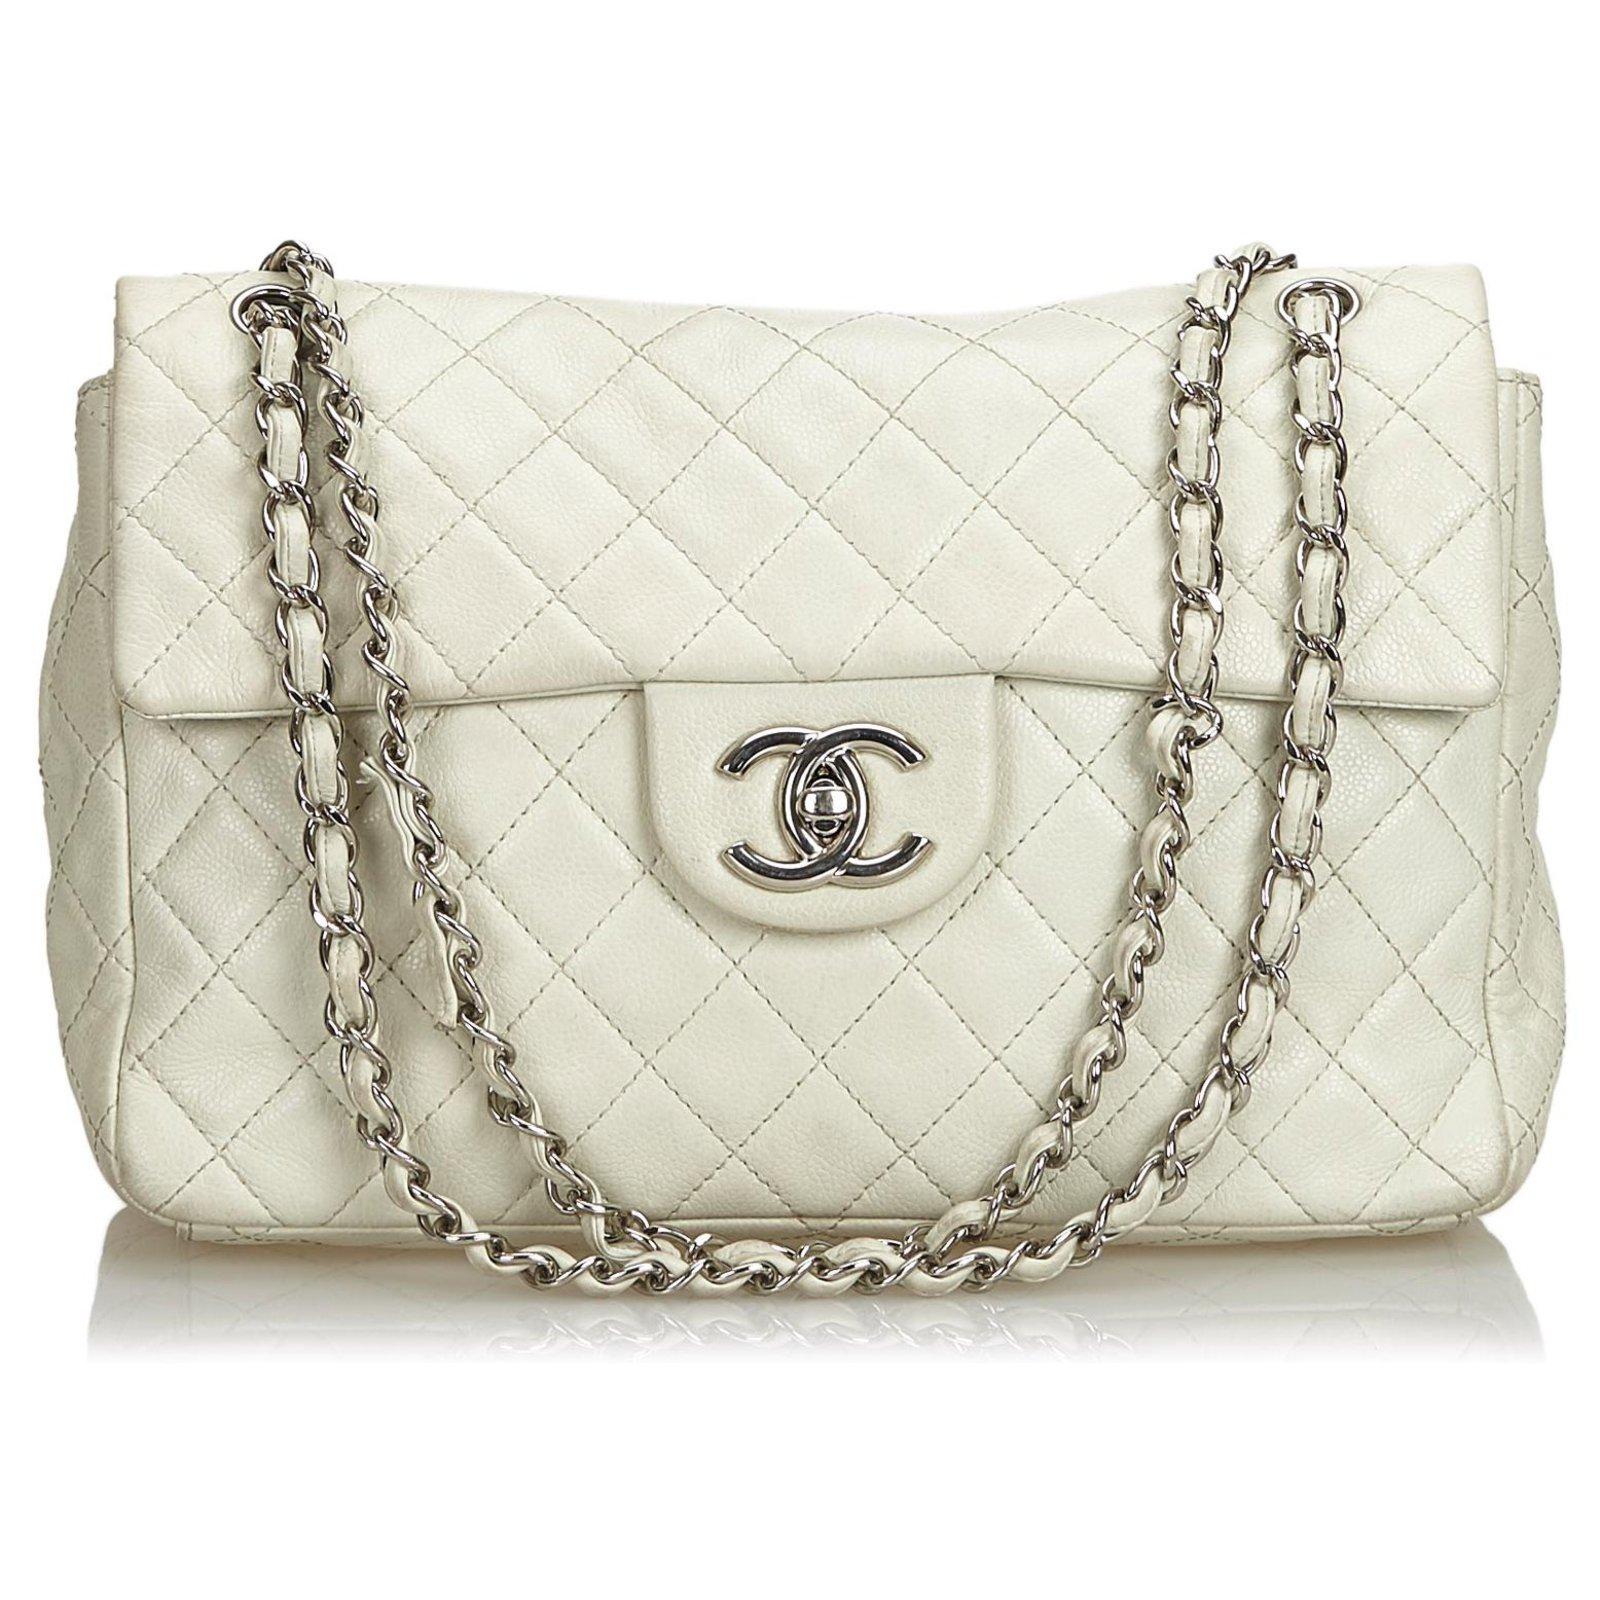 de31d71d201 Chanel Chanel White Classic Jumbo Caviar Single Flap Bag Handbags Leather  White ref.126488